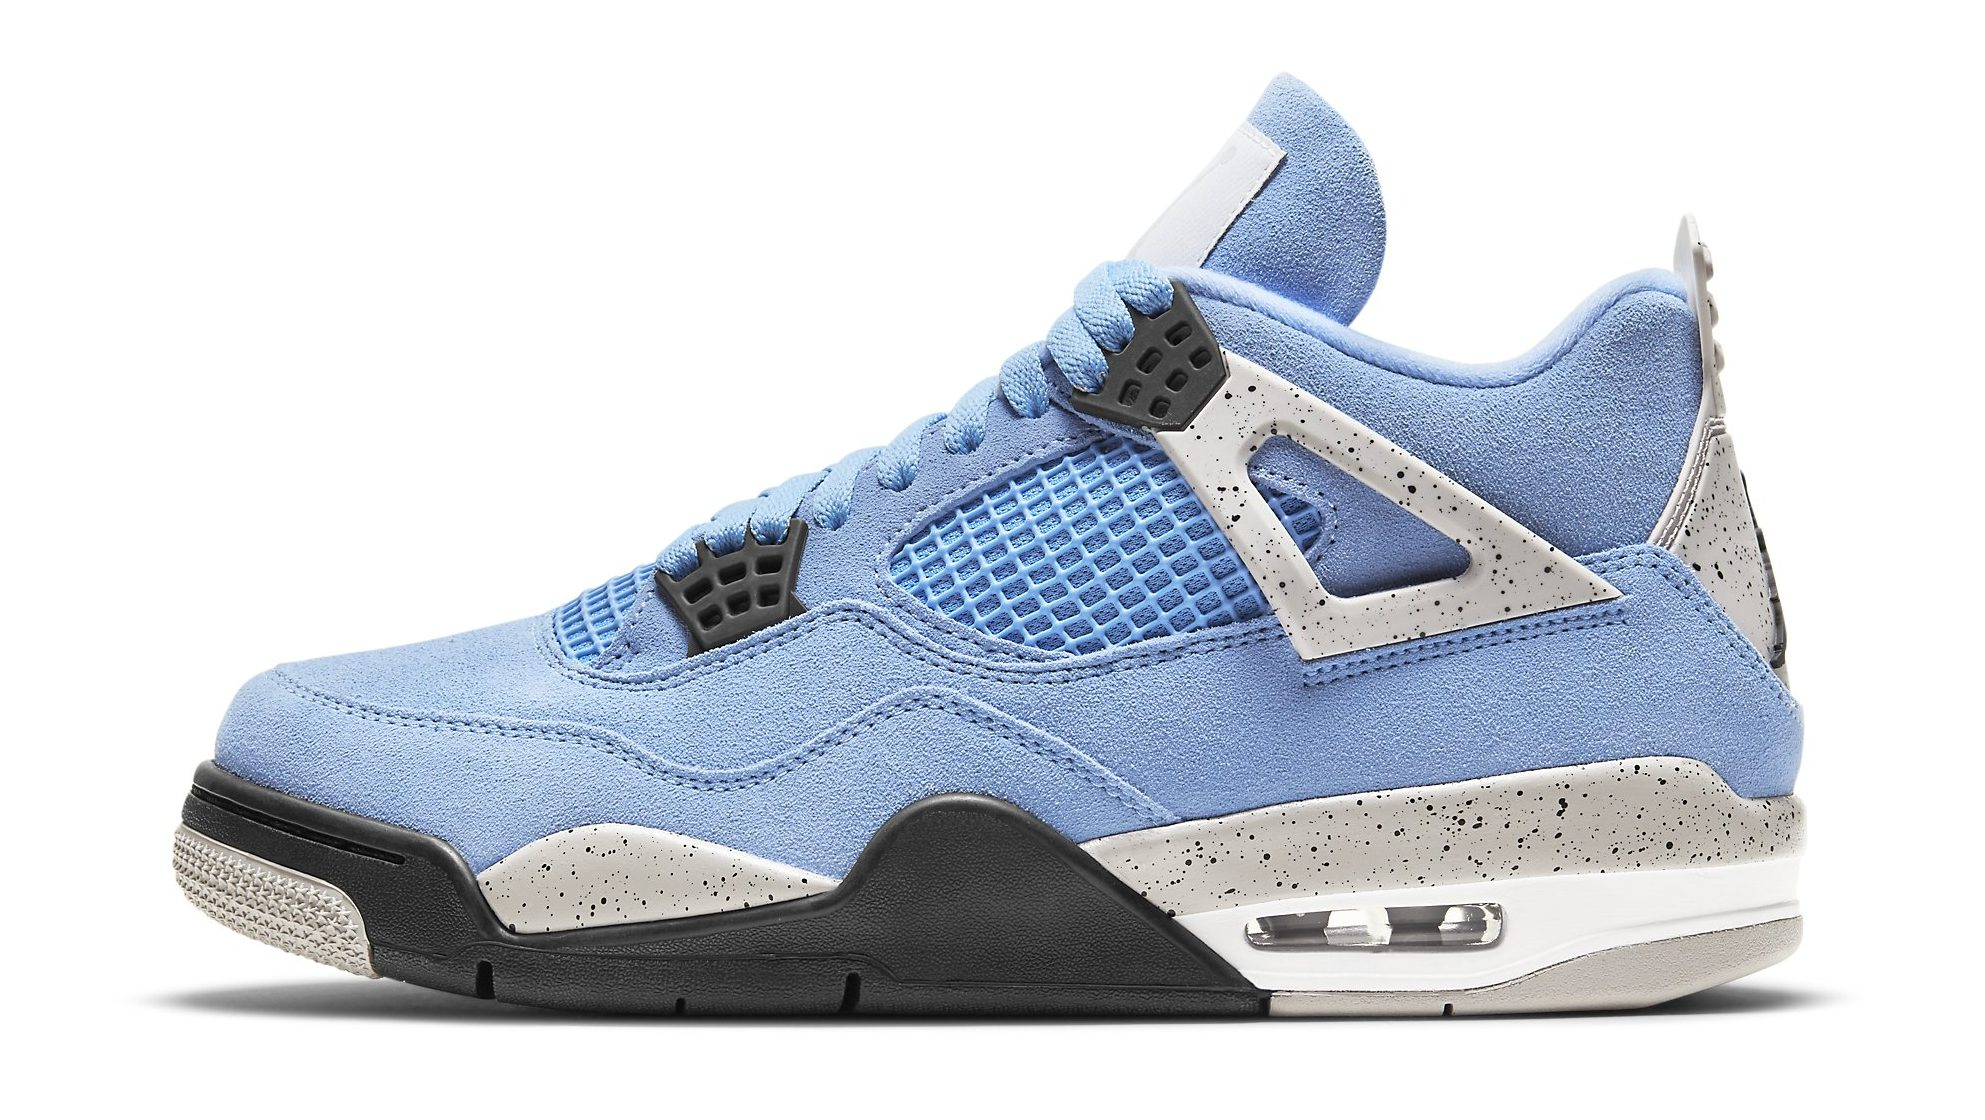 Air Jordan 4 'University Blue' Release Info: How to Buy a Pair ...